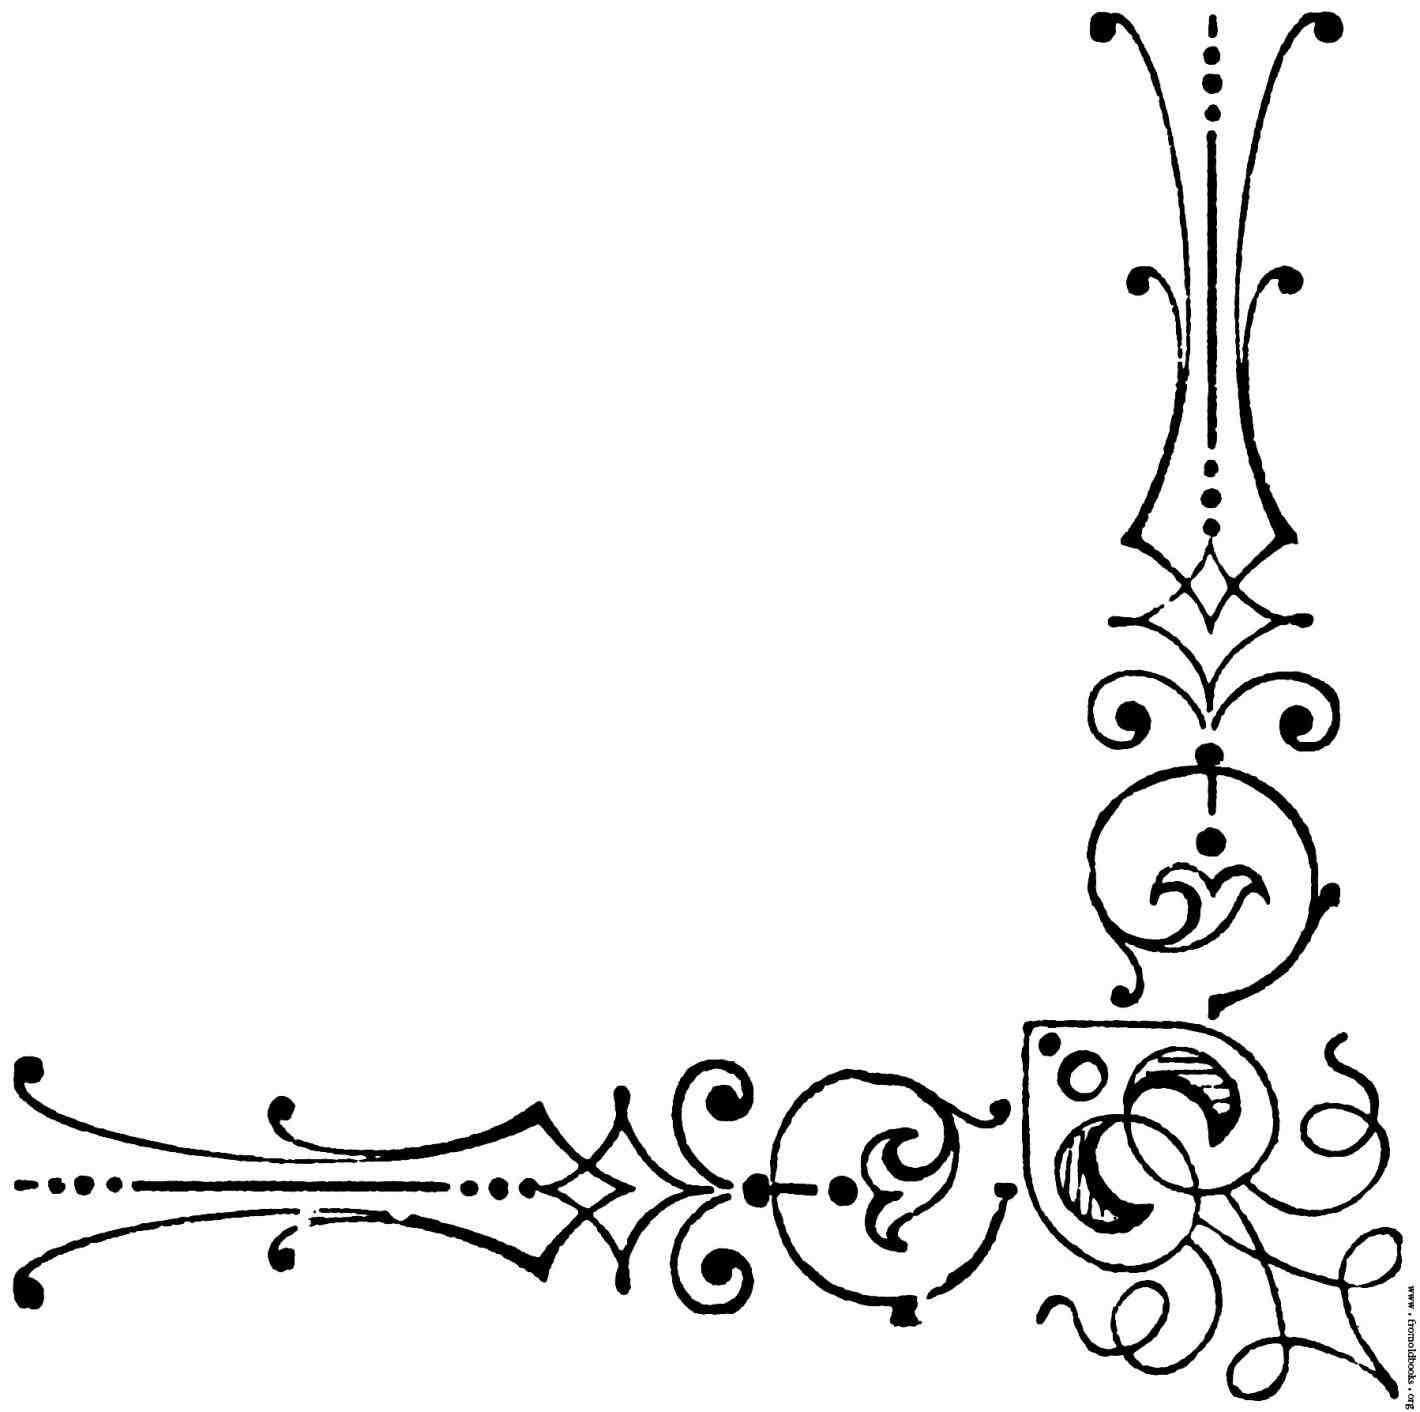 1420x1412 Free Wedding Corner Border Clipart Damask Clip Art Rectangle S